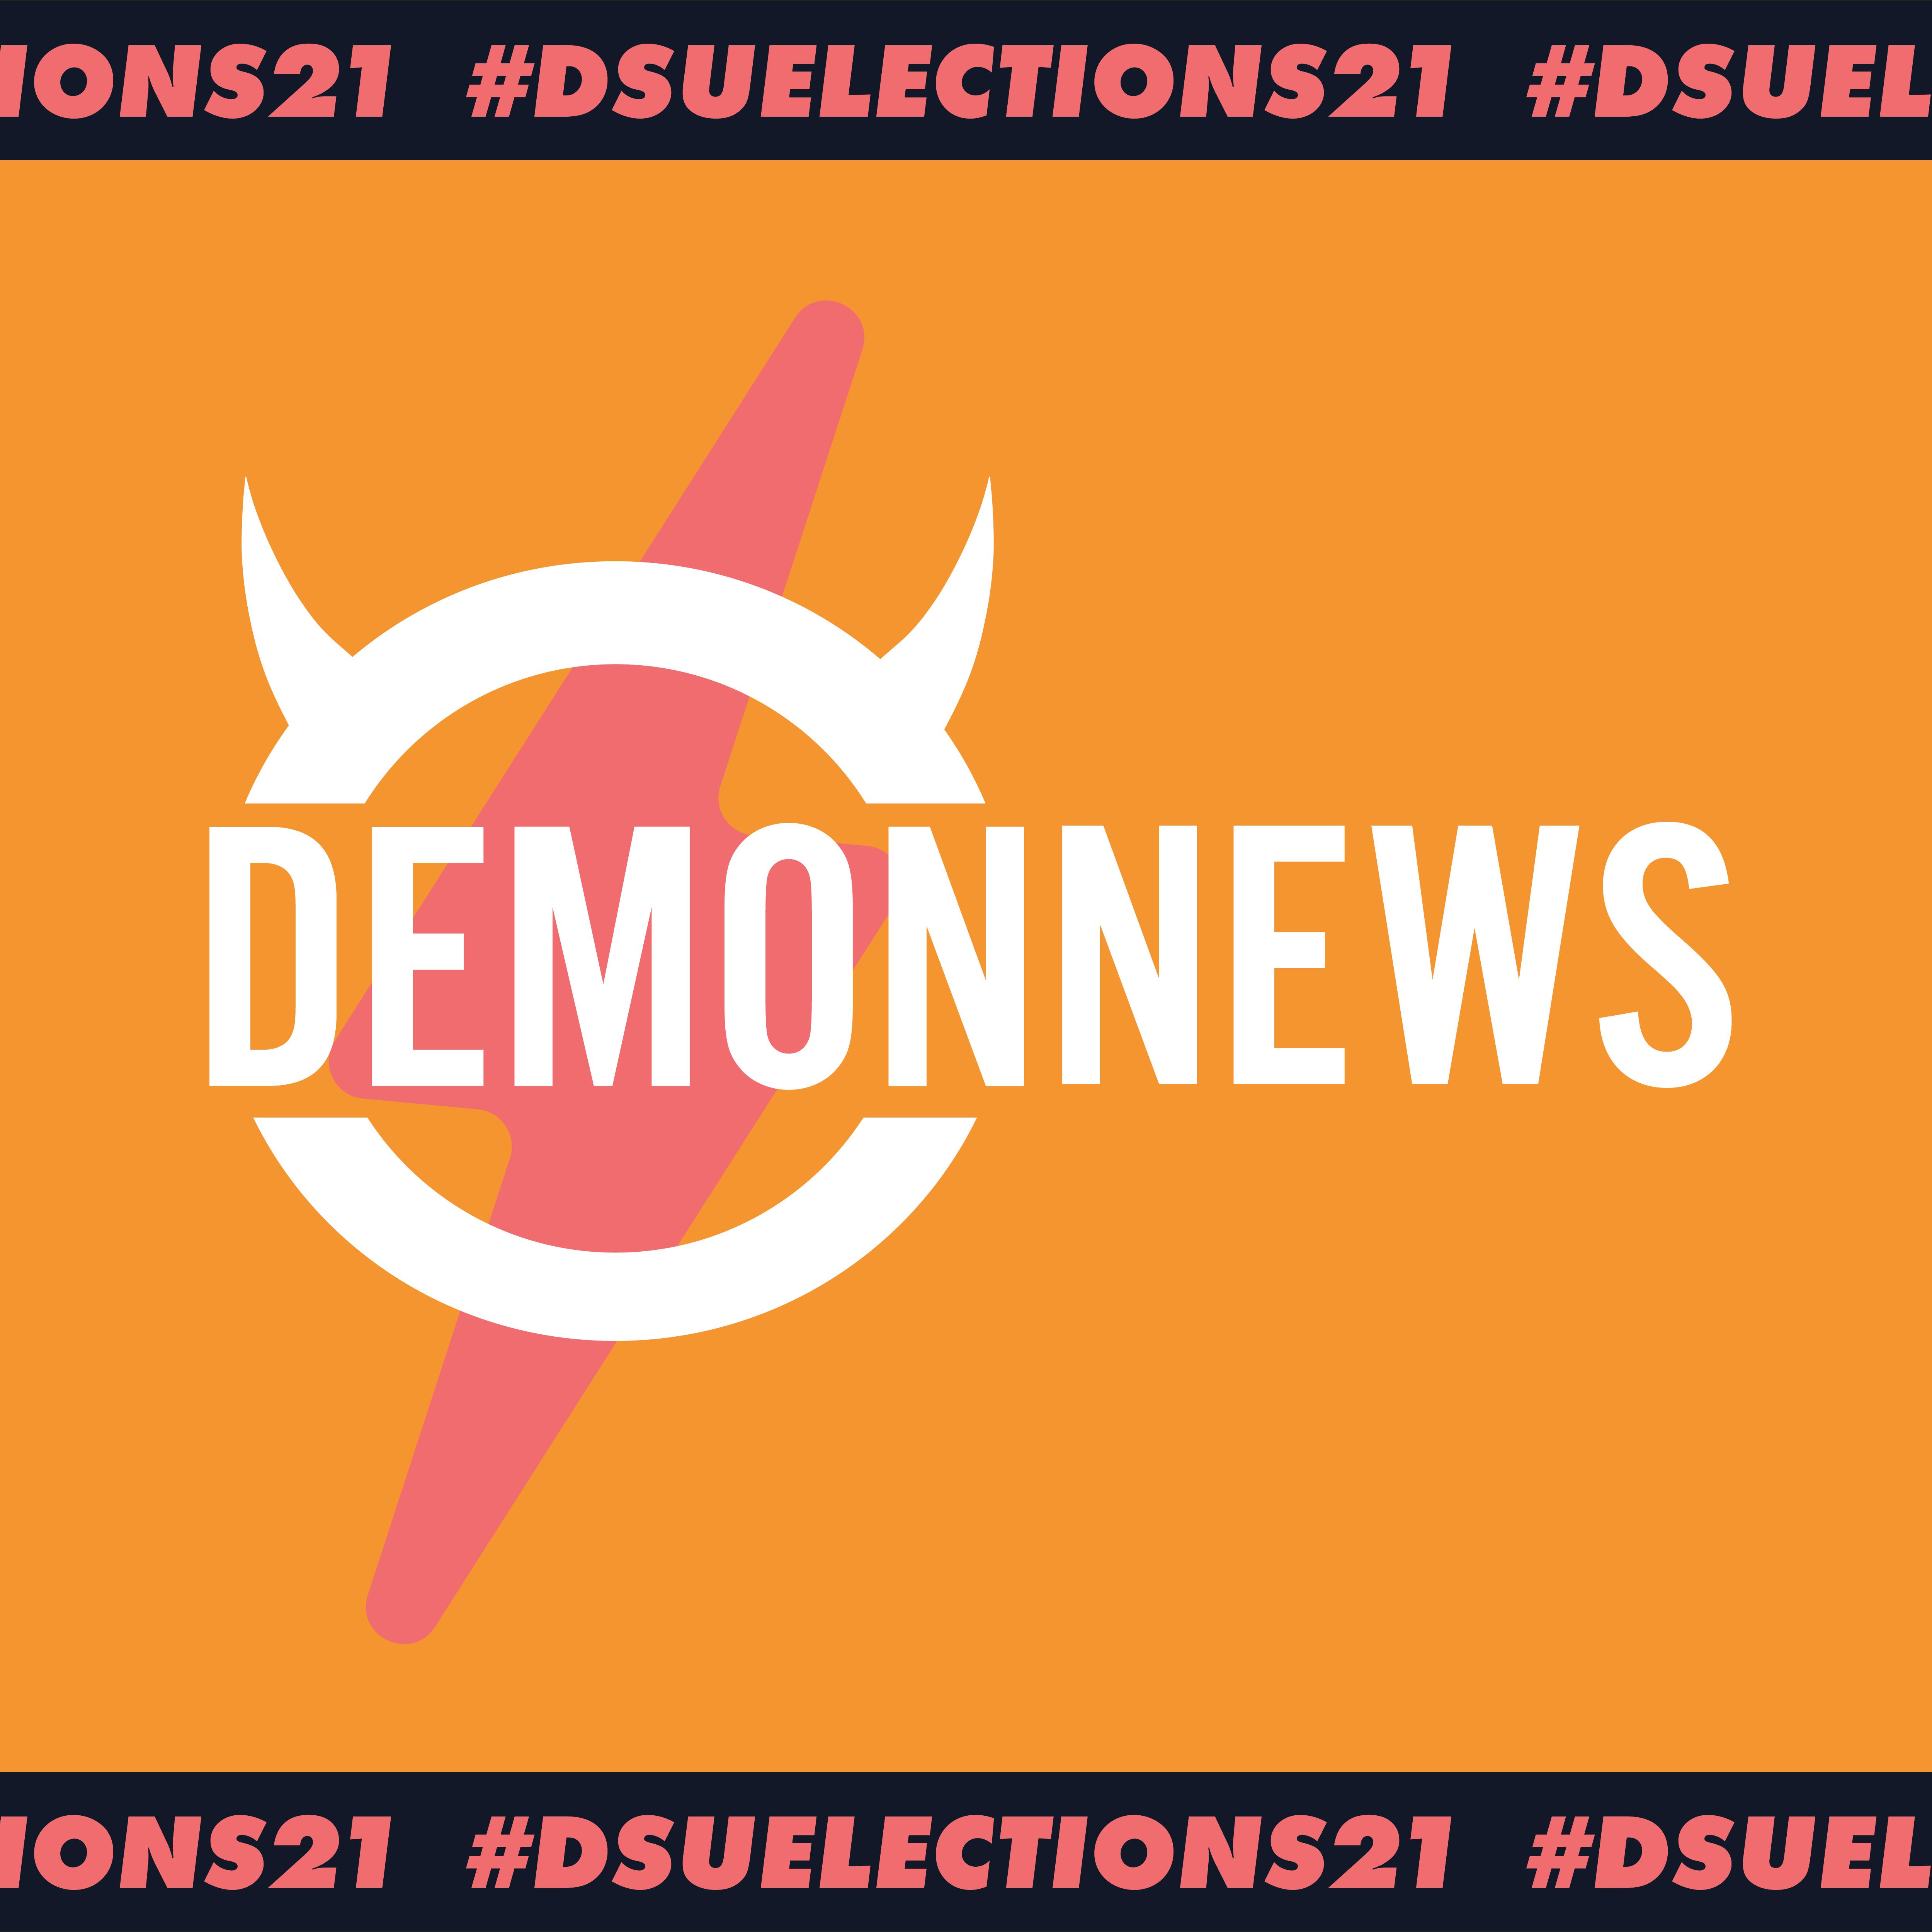 Demon news